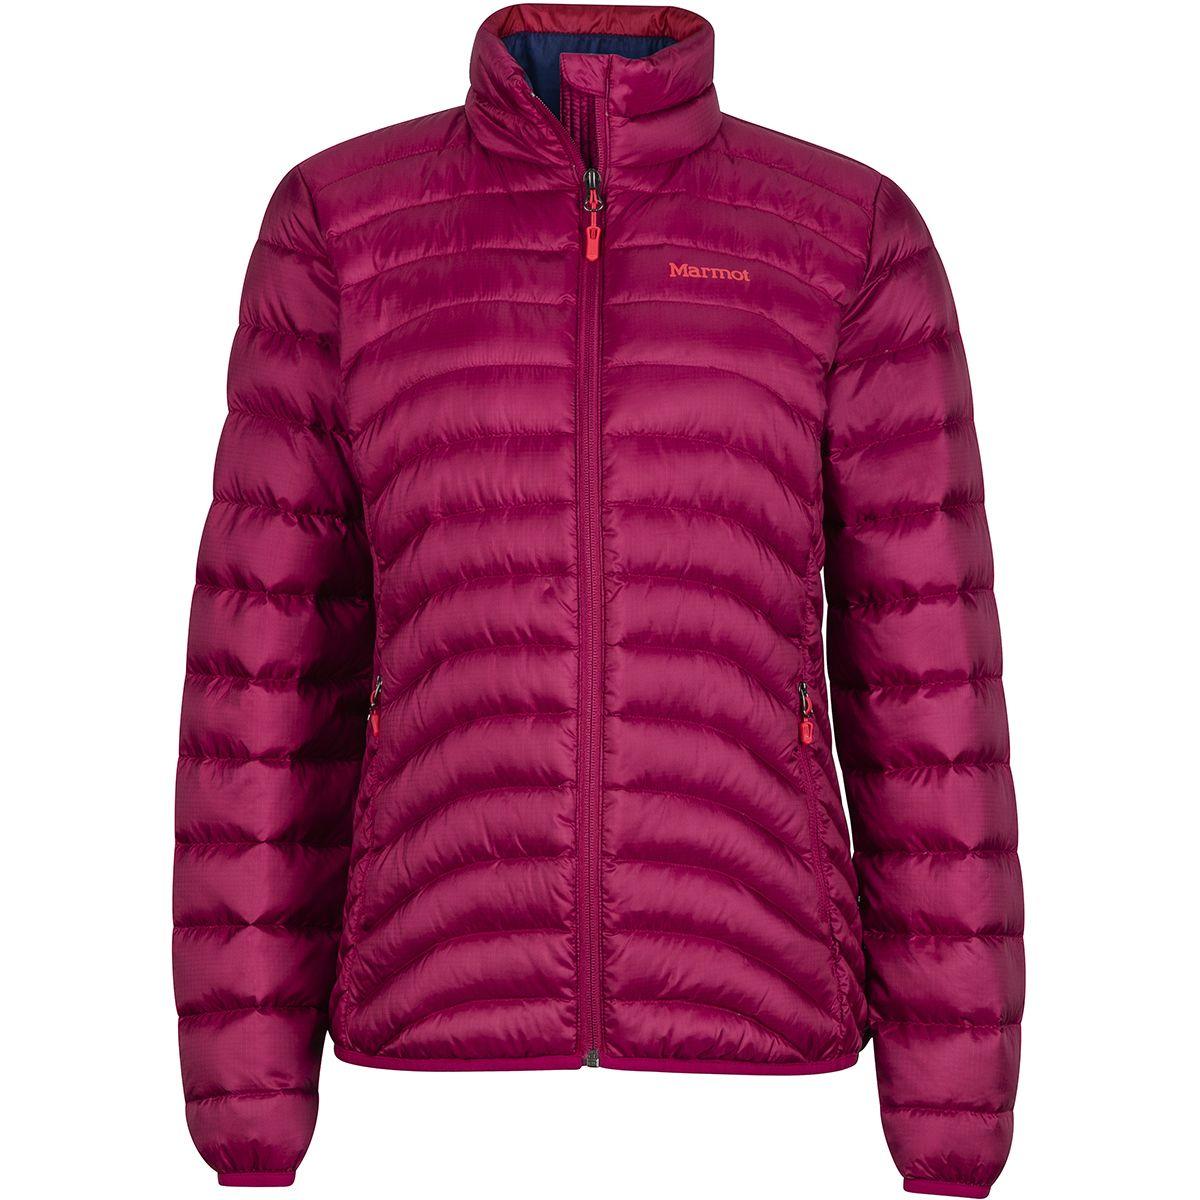 Marmot Aruna Down Jacket - Women